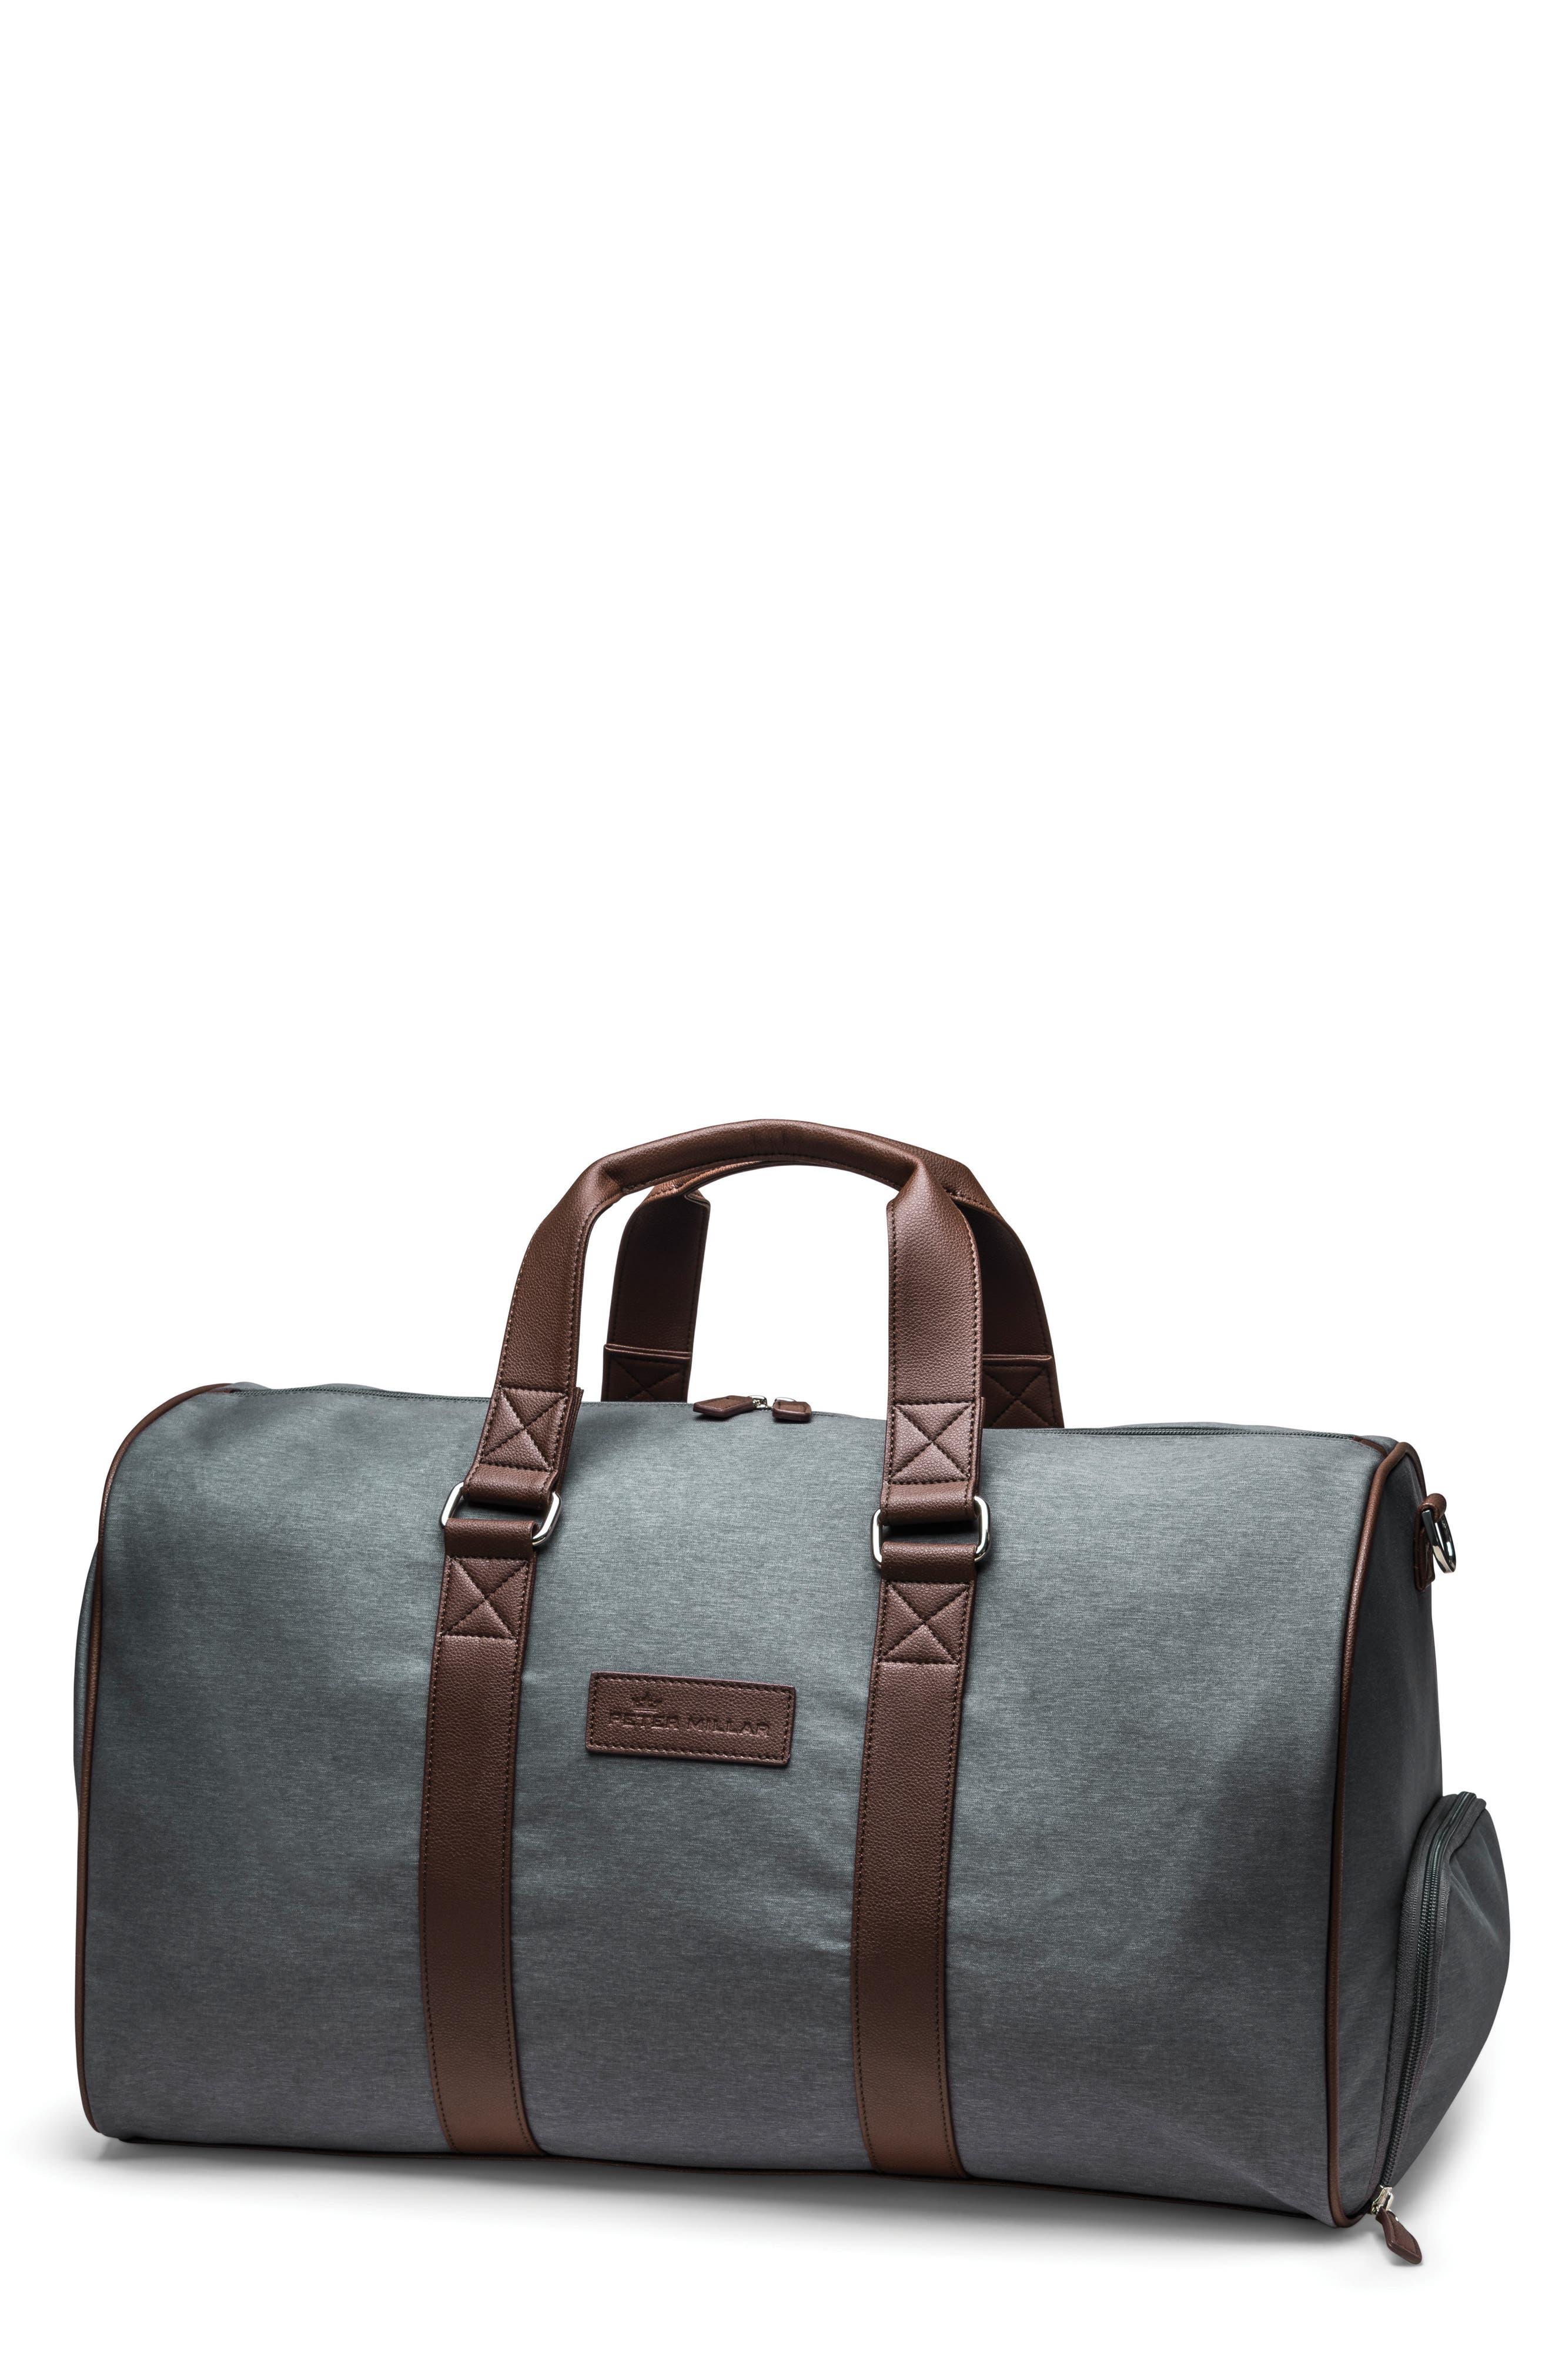 Twill Duffel Bag,                             Main thumbnail 1, color,                             022